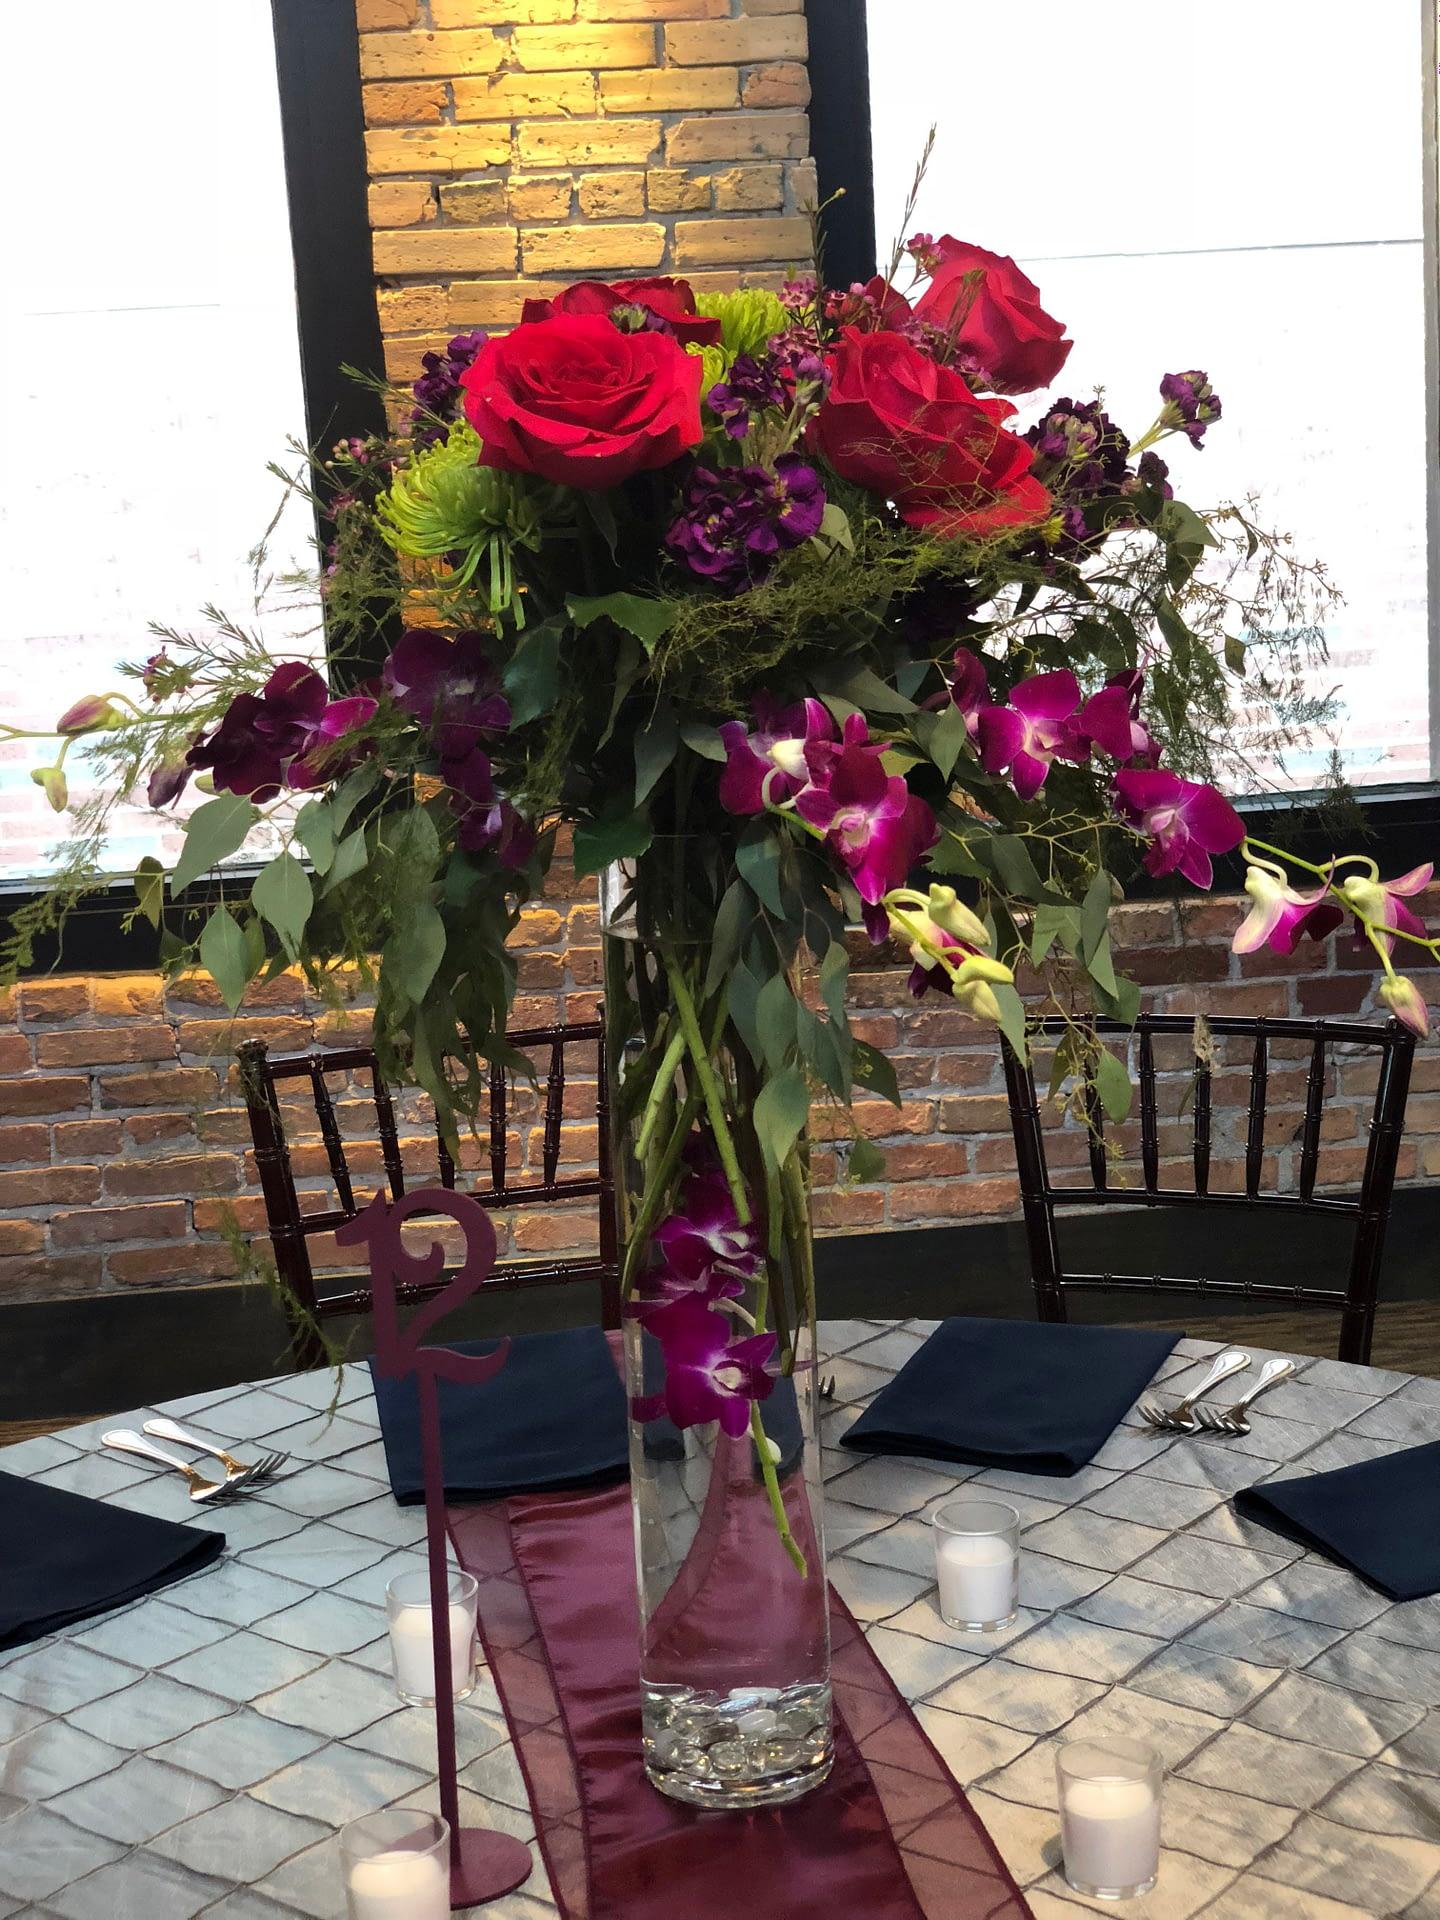 minneapolis event center reception tall floral centerpiece